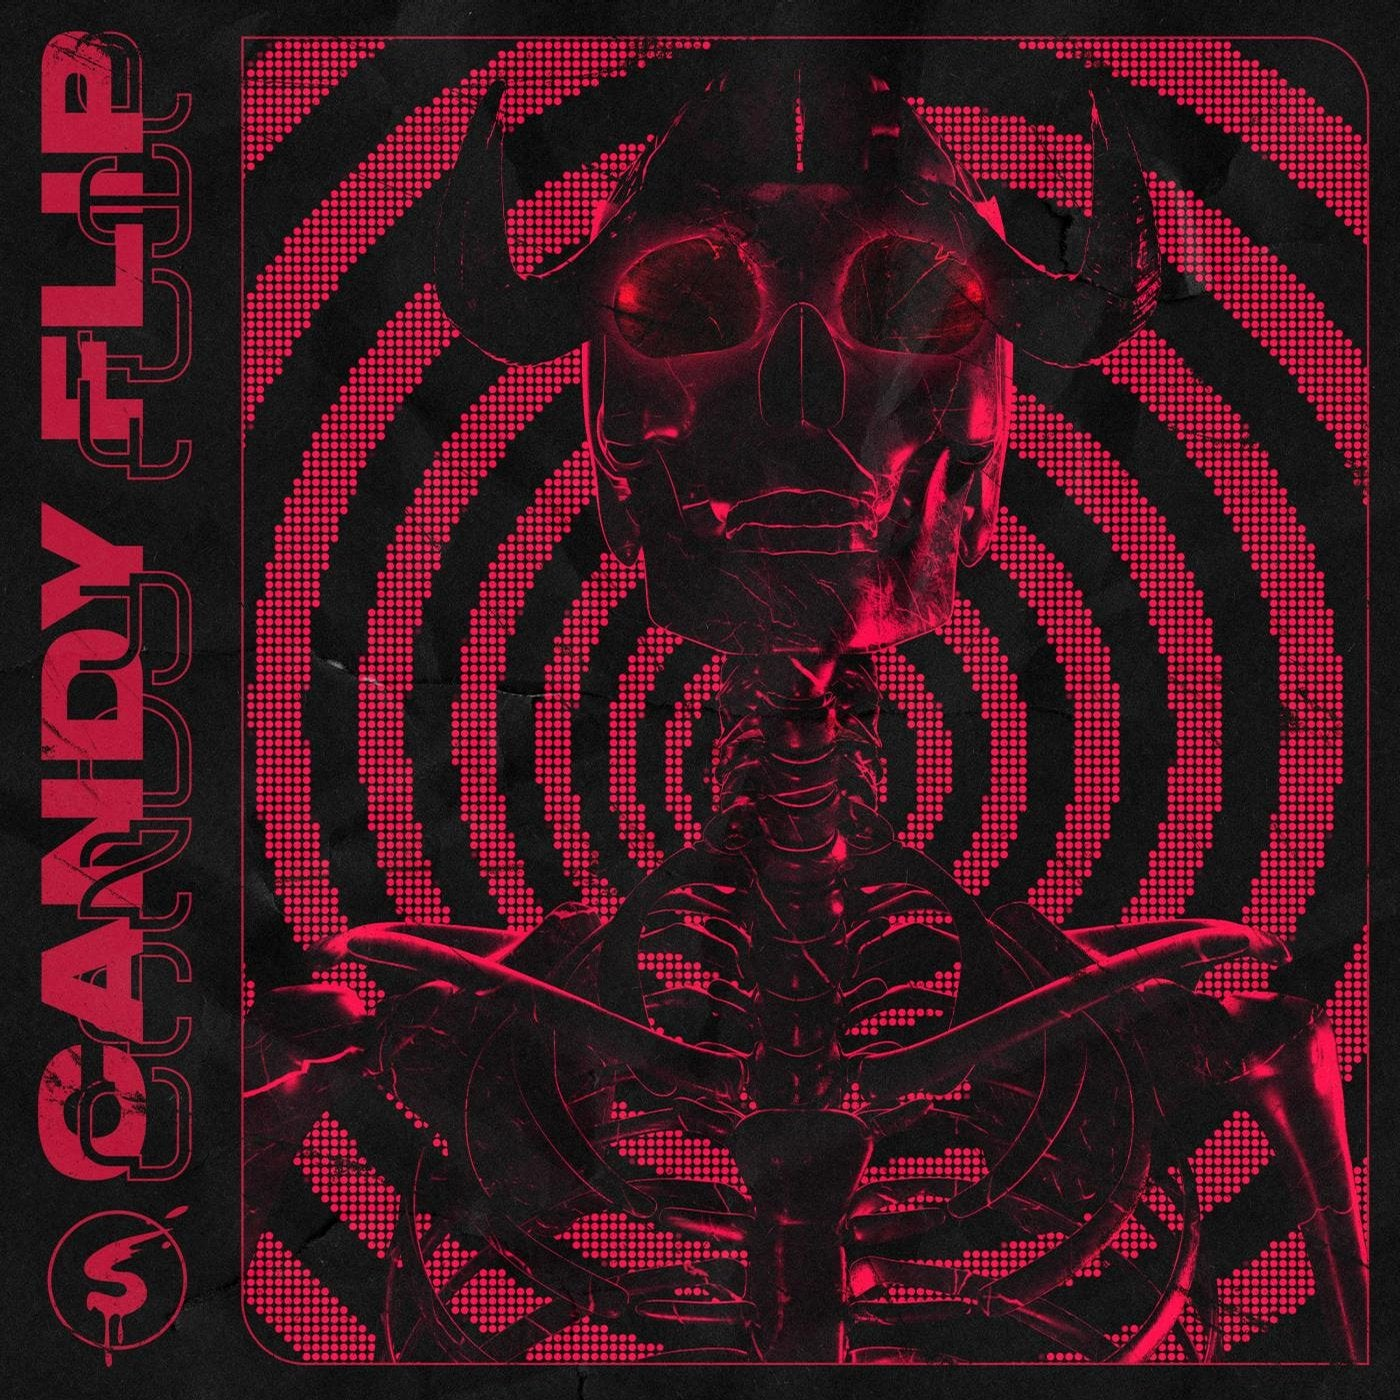 Candy Flip (Original Mix)